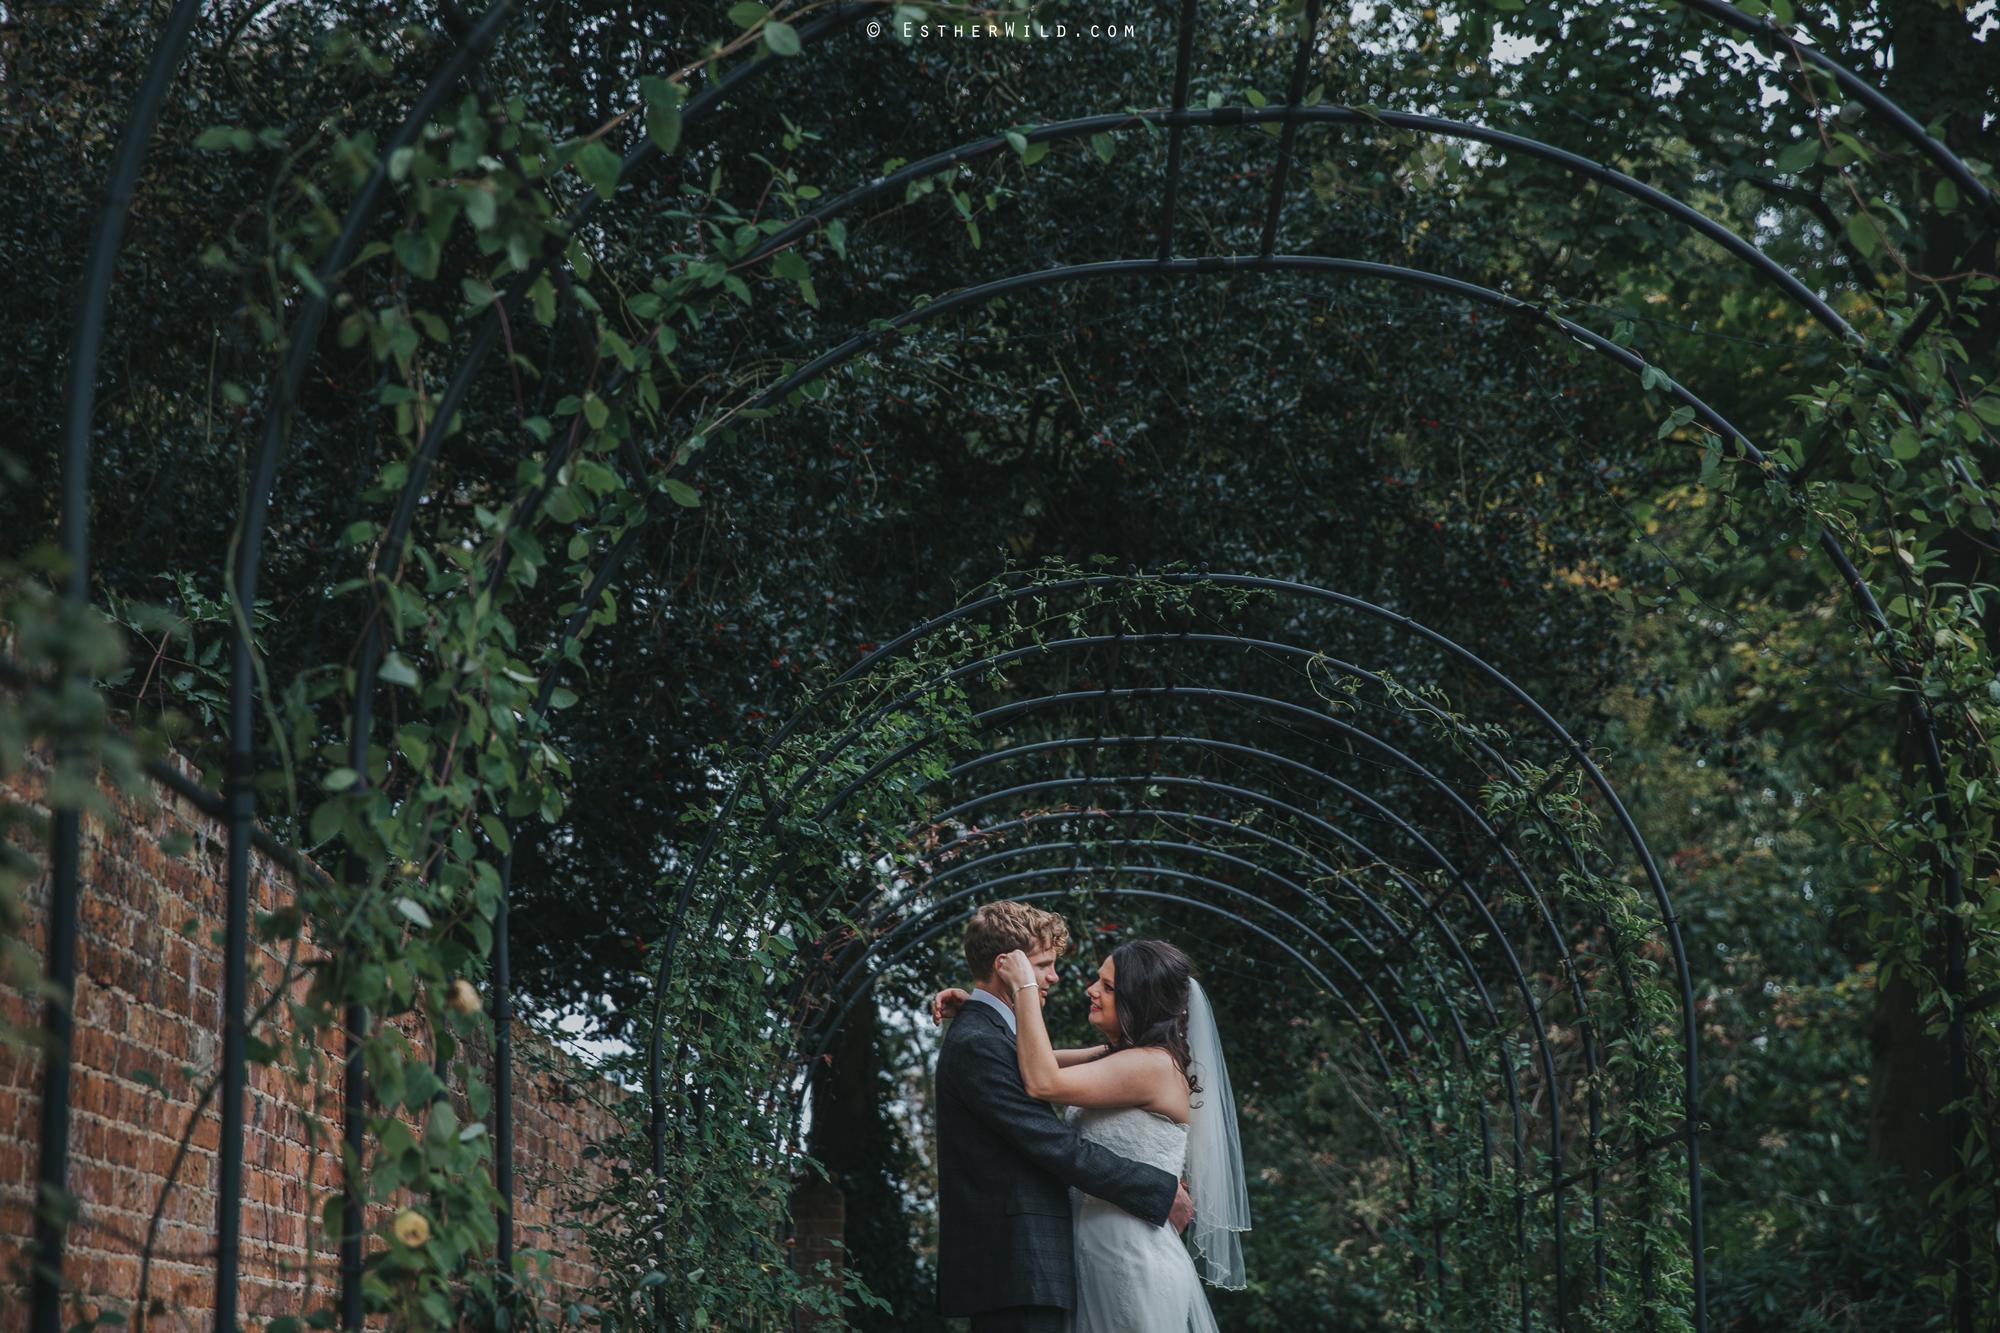 Reading_Room_Weddings_Alby_Norwich_Photographer_Esther_Wild_IMG_1775.jpg